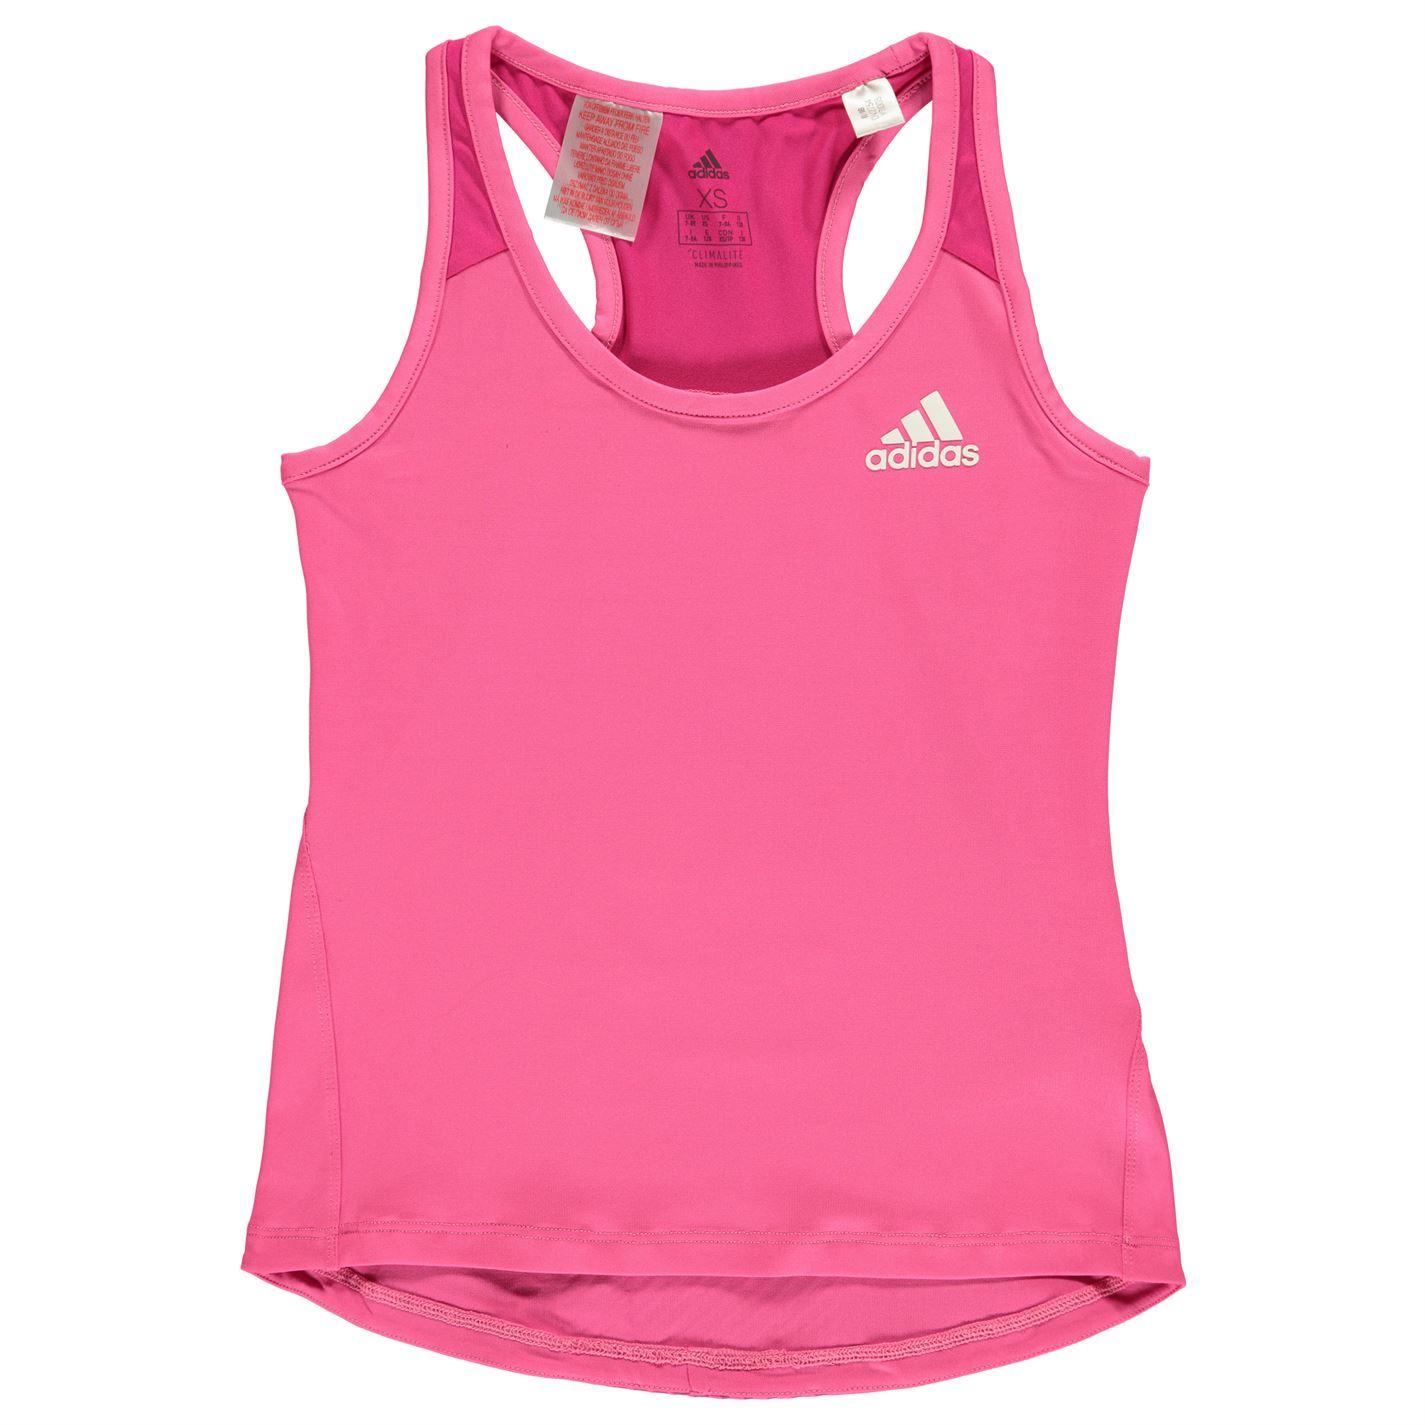 Adidas Logo Tank Top Junior Girls